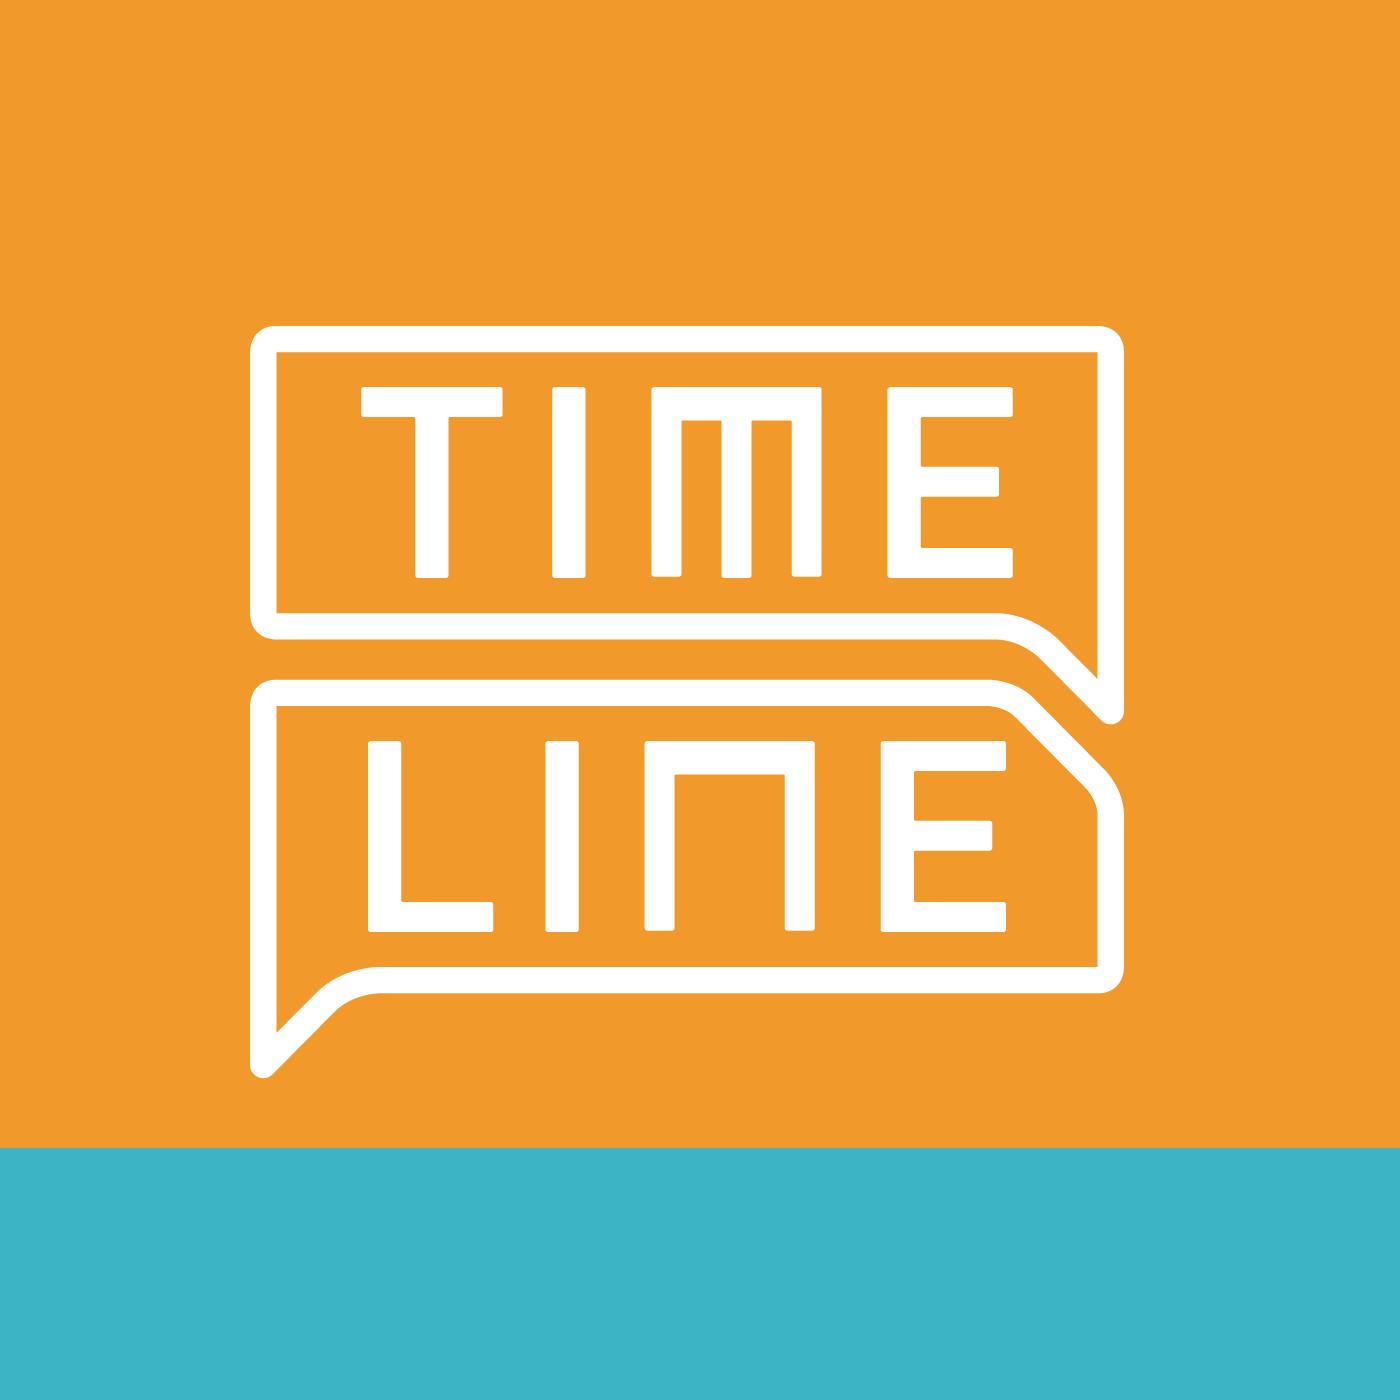 Timeline Gaúcha 24/04/2017